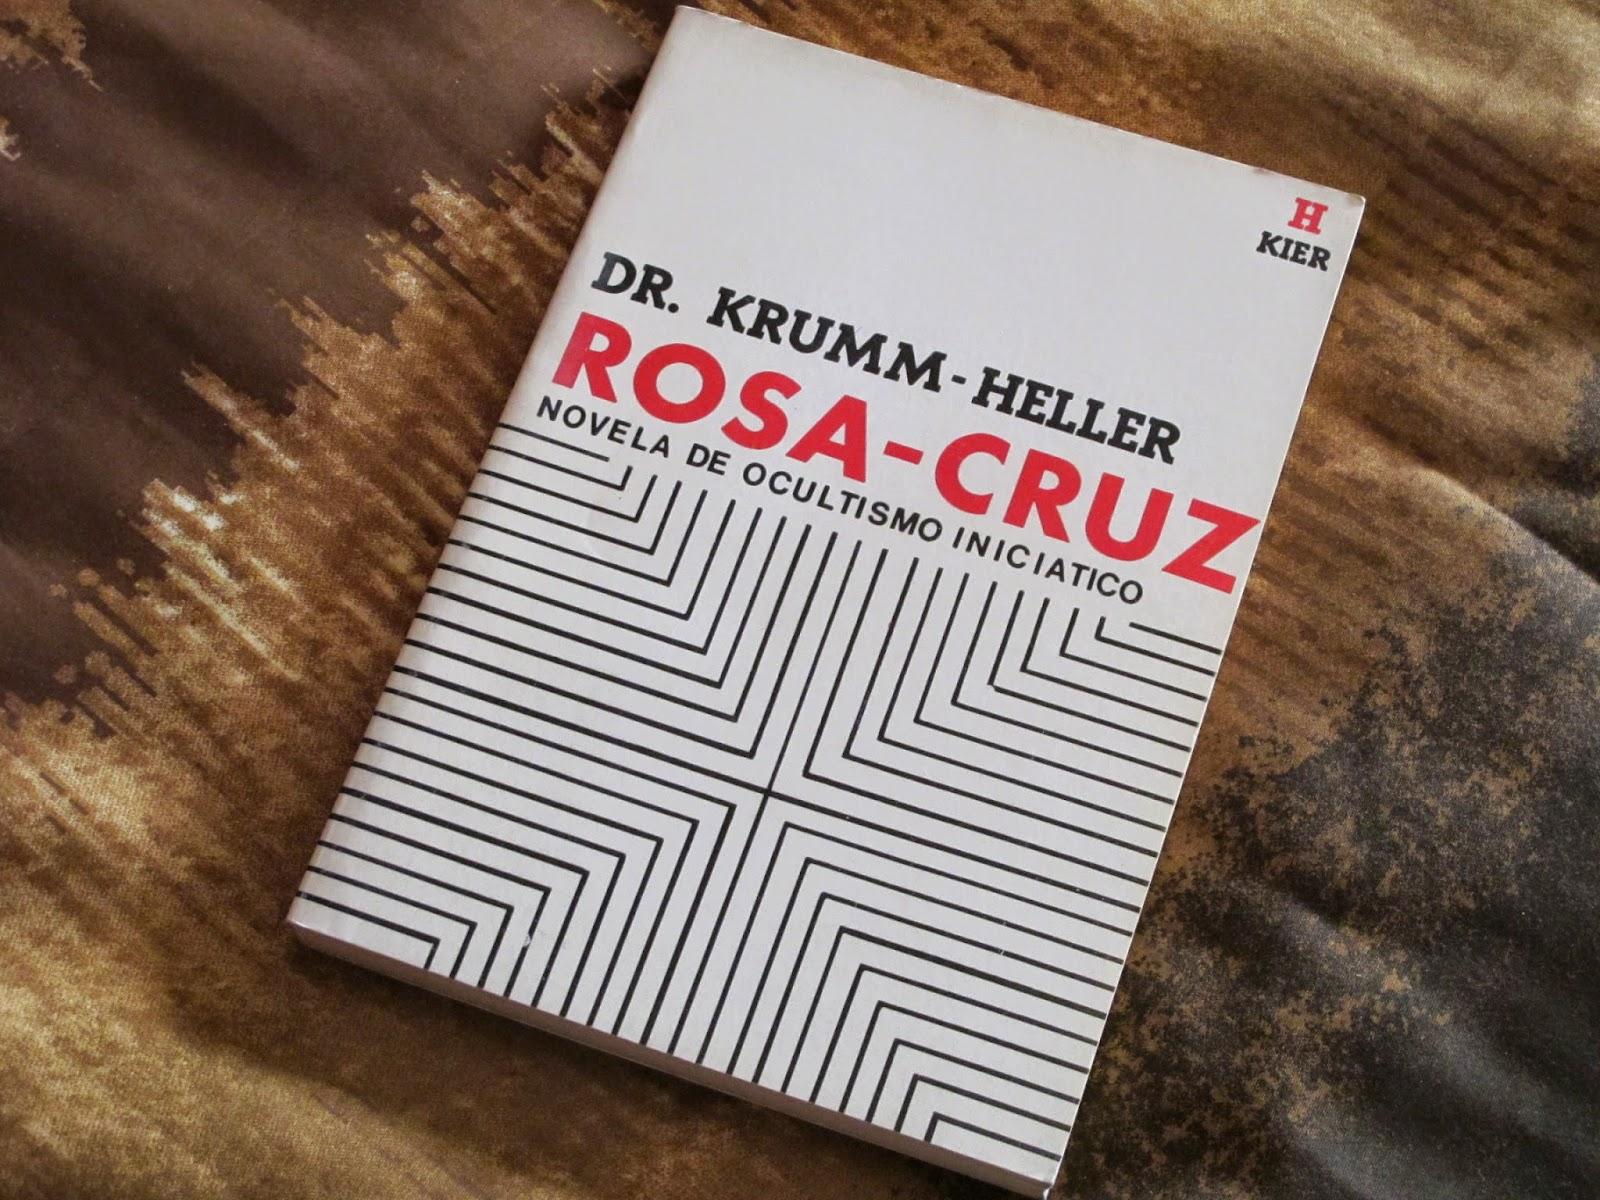 ROSA-CRUZ Novela de Ocultismo Iniciático del Dr. Krumm Heller (Maestro Huiracocha) IMG_0404